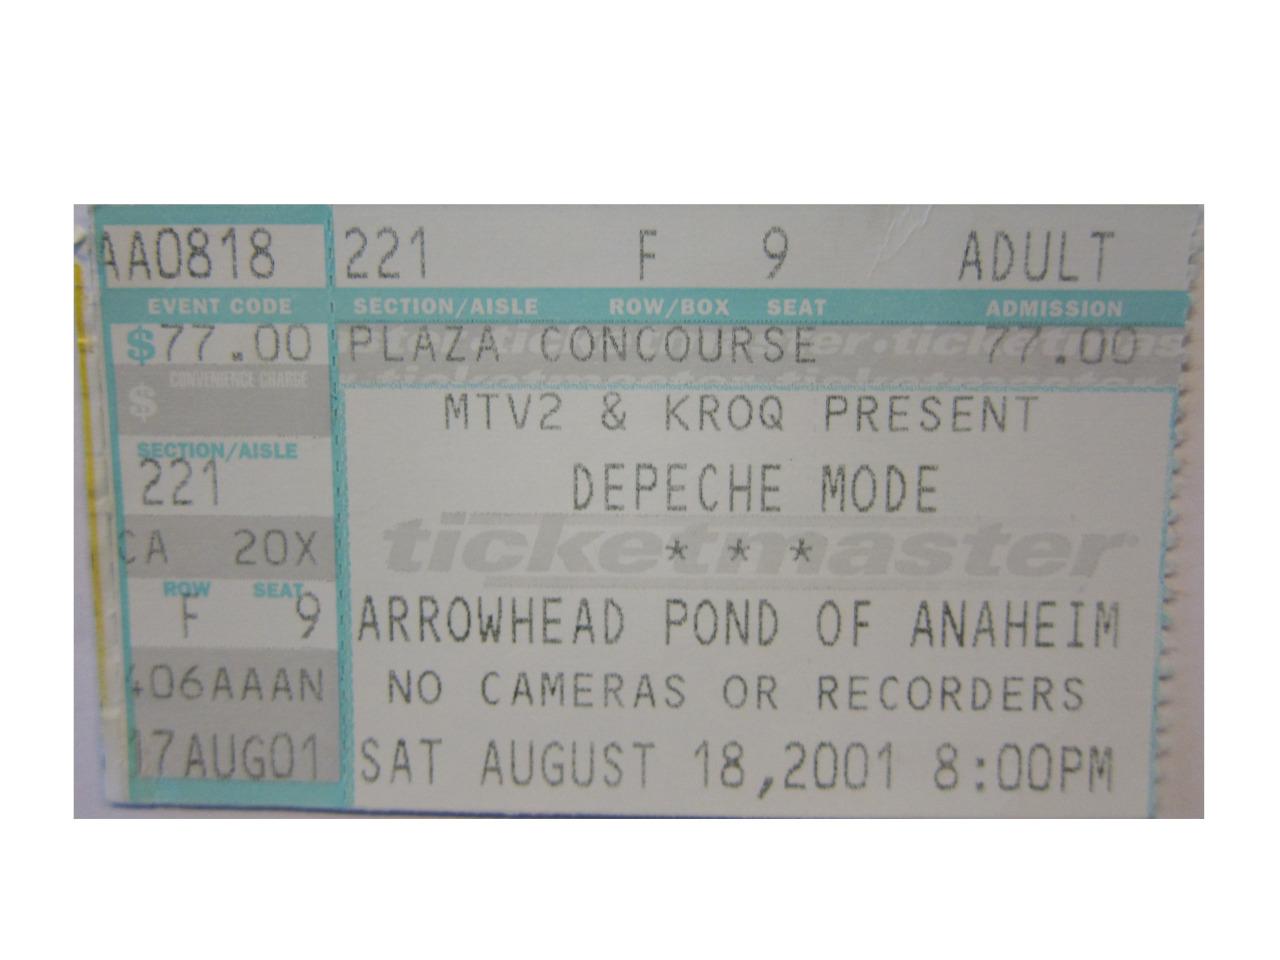 Arrowhead Pond Anaheim